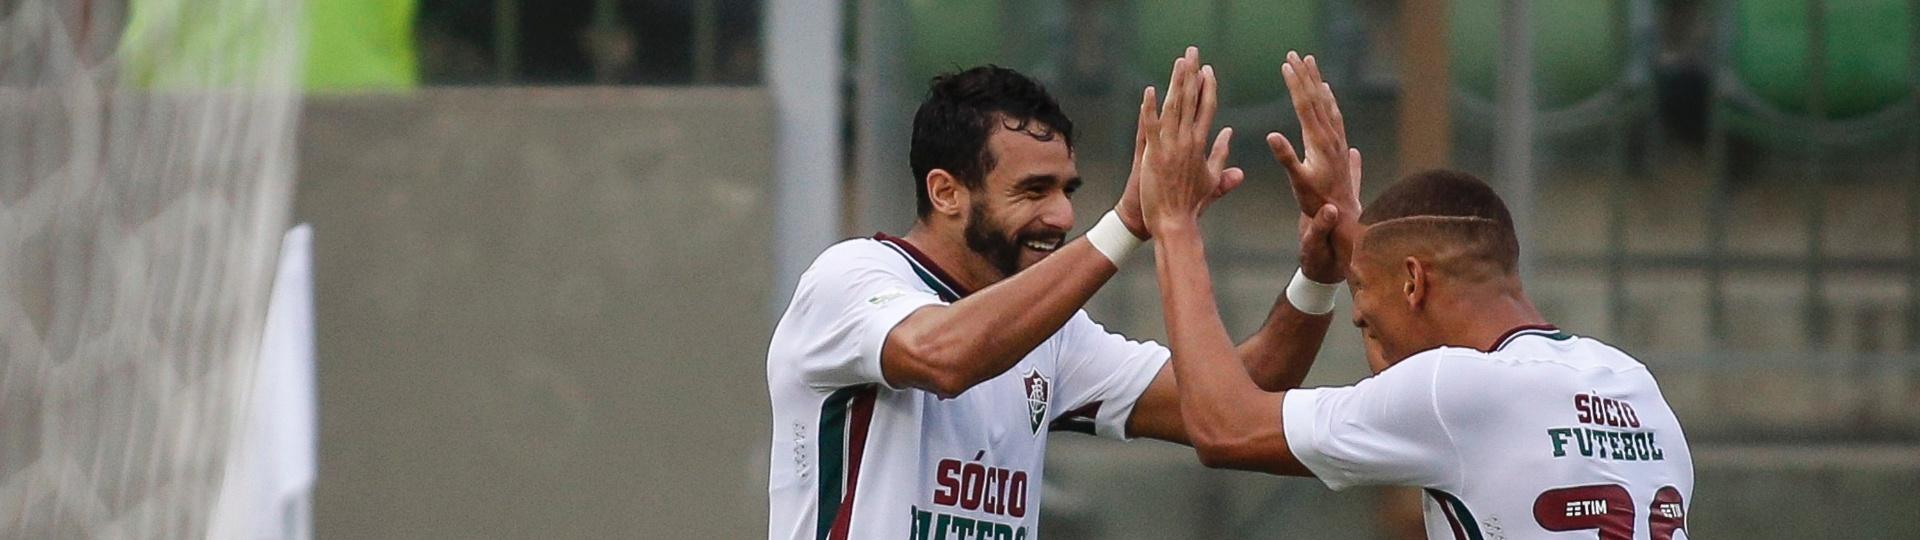 Henrique Dourado e Richarlison comemoram gol do Fluminense contra o Atlético-MG